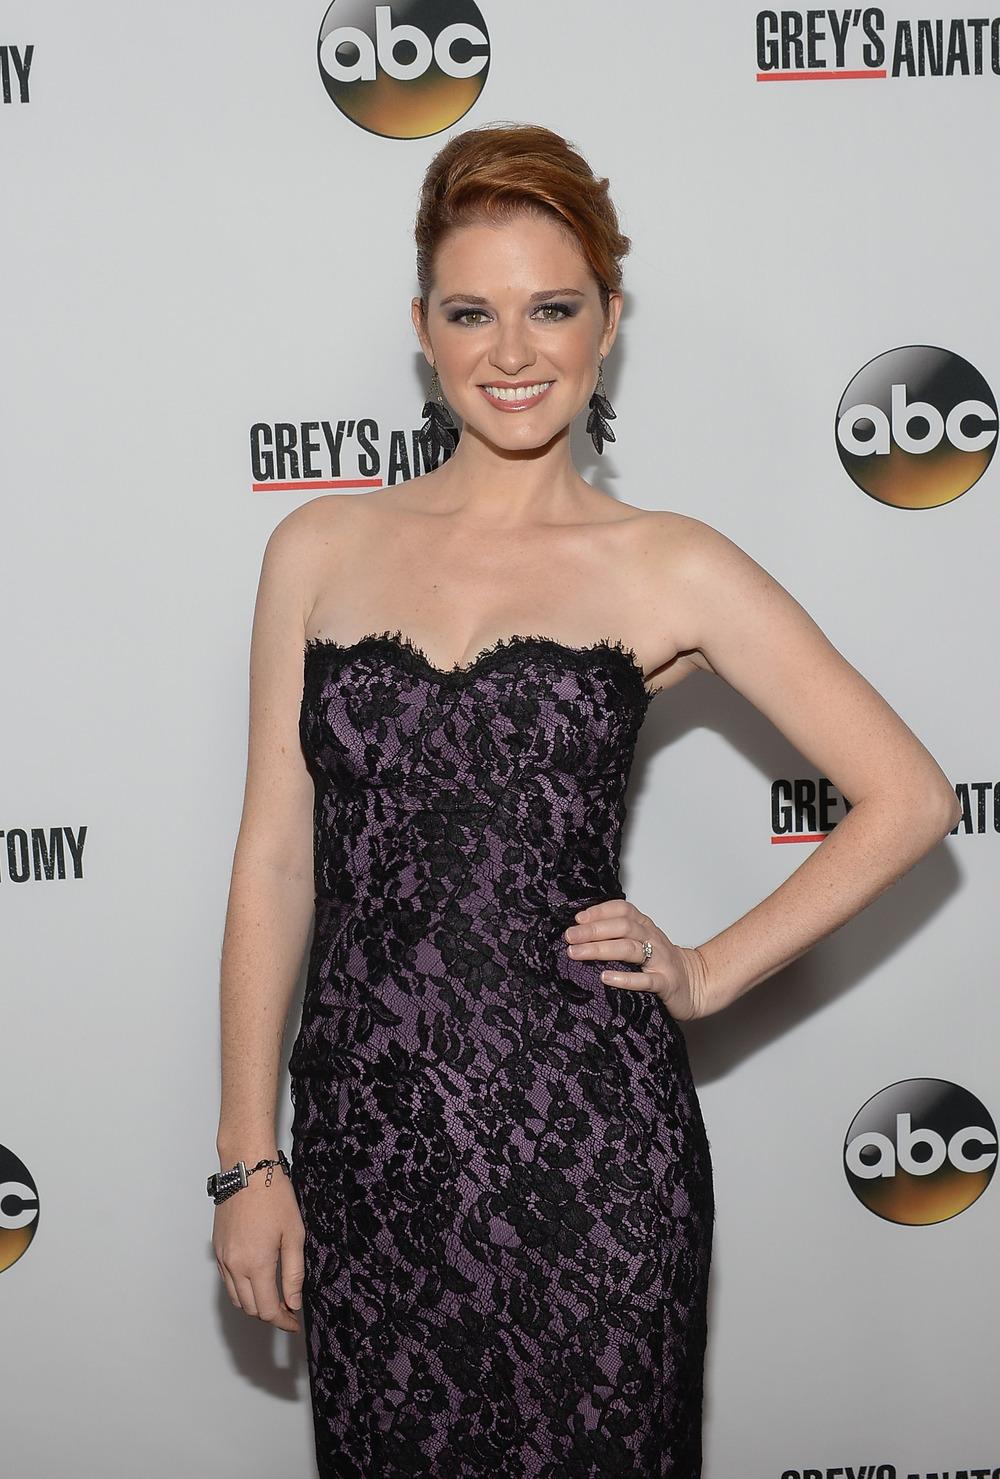 Grey's Anatomy: Win a Chance to Go Dress Shopping With Sarah Drew